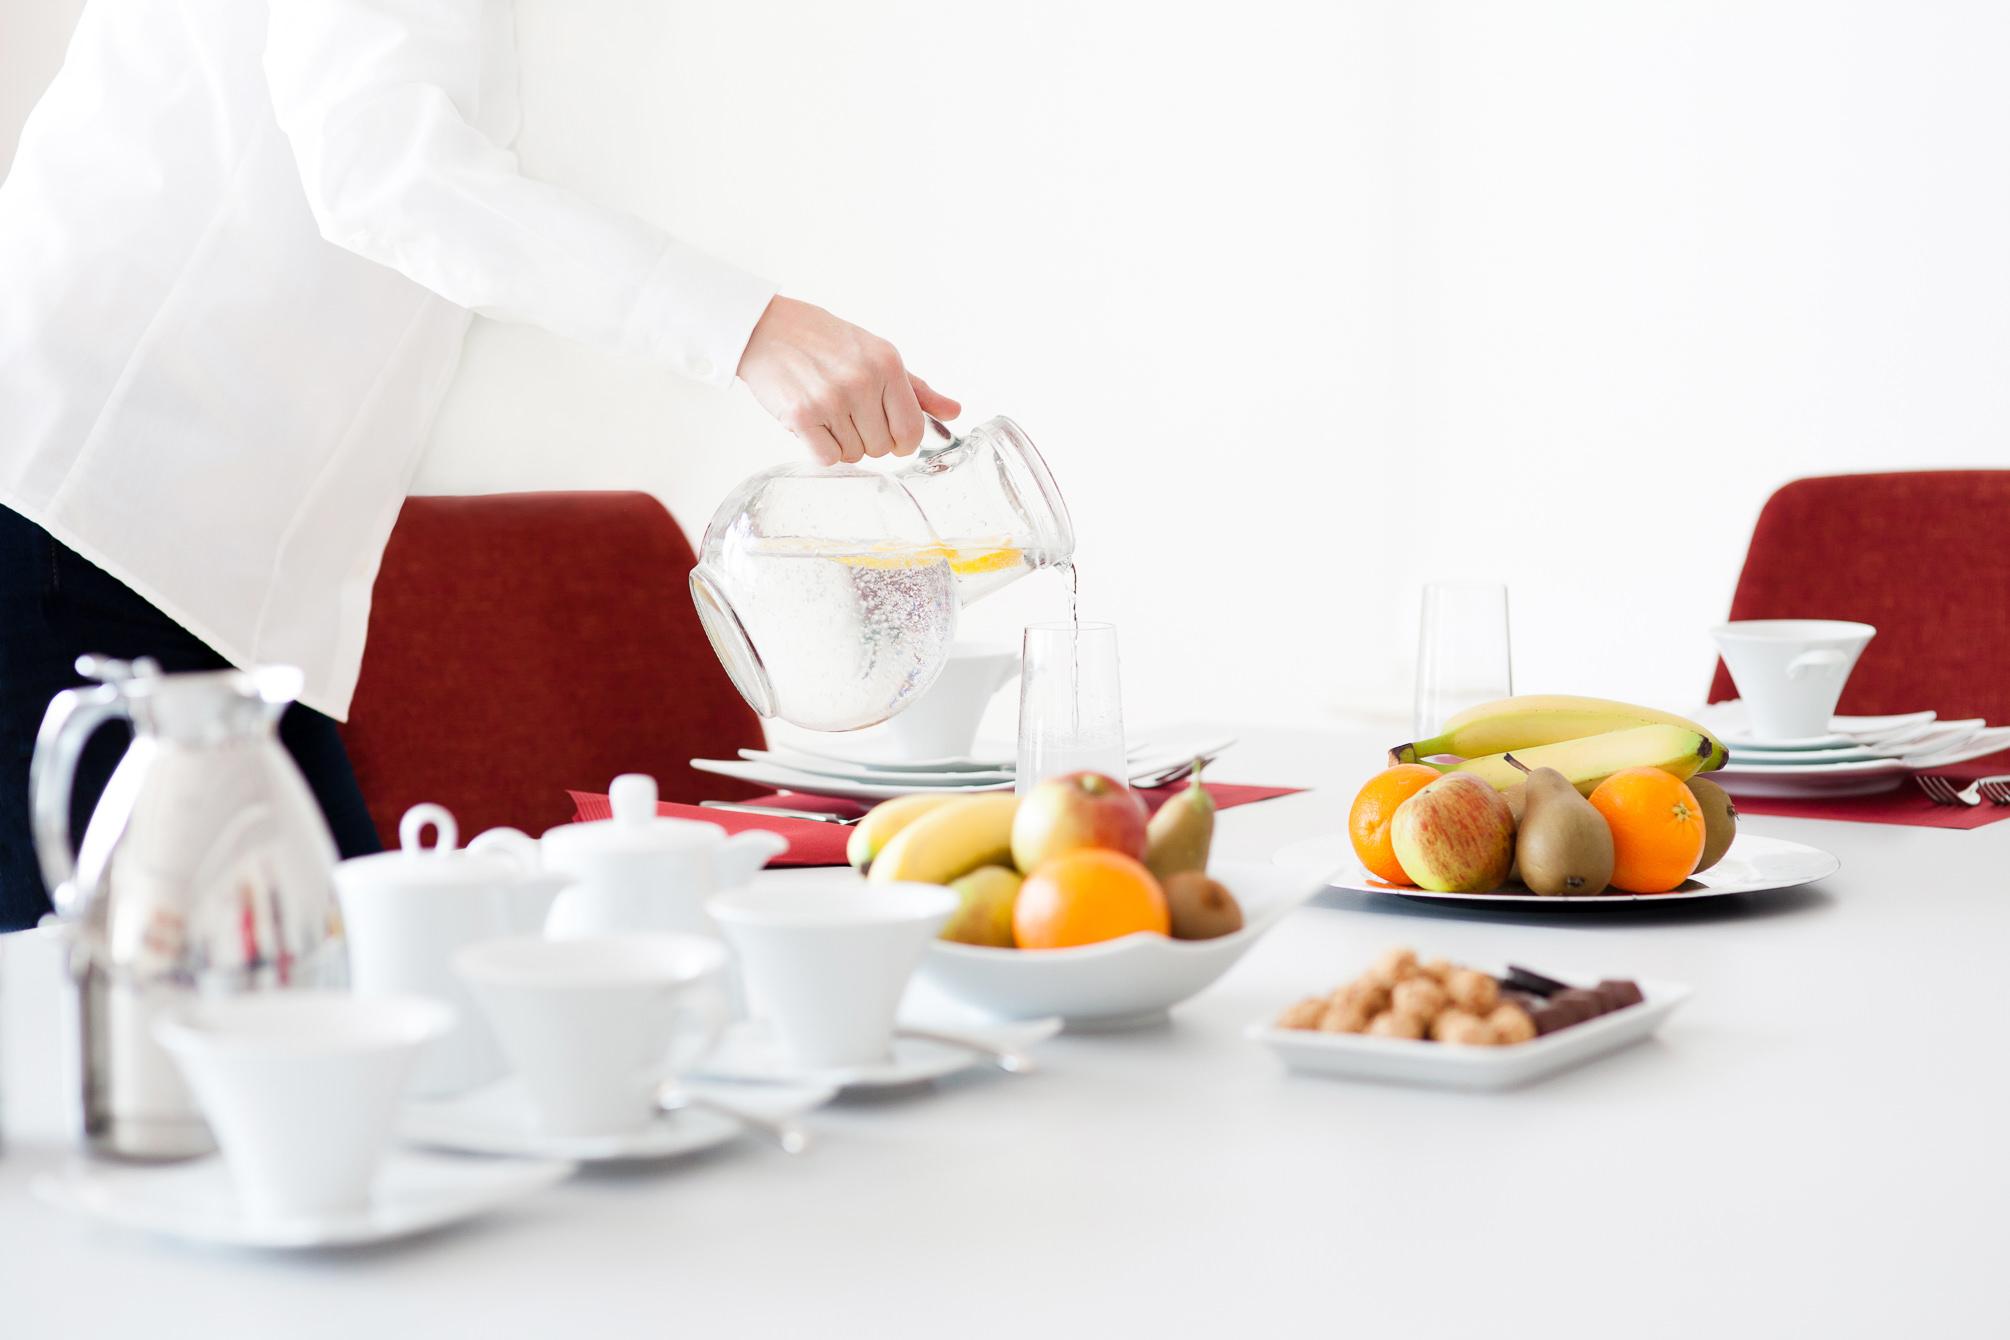 Catering, Food, Foodfotografie, Foodfoto, Konferenzservice, Konferenzgedeck, Obst, Kaffee, Claudia Zurlo Photography